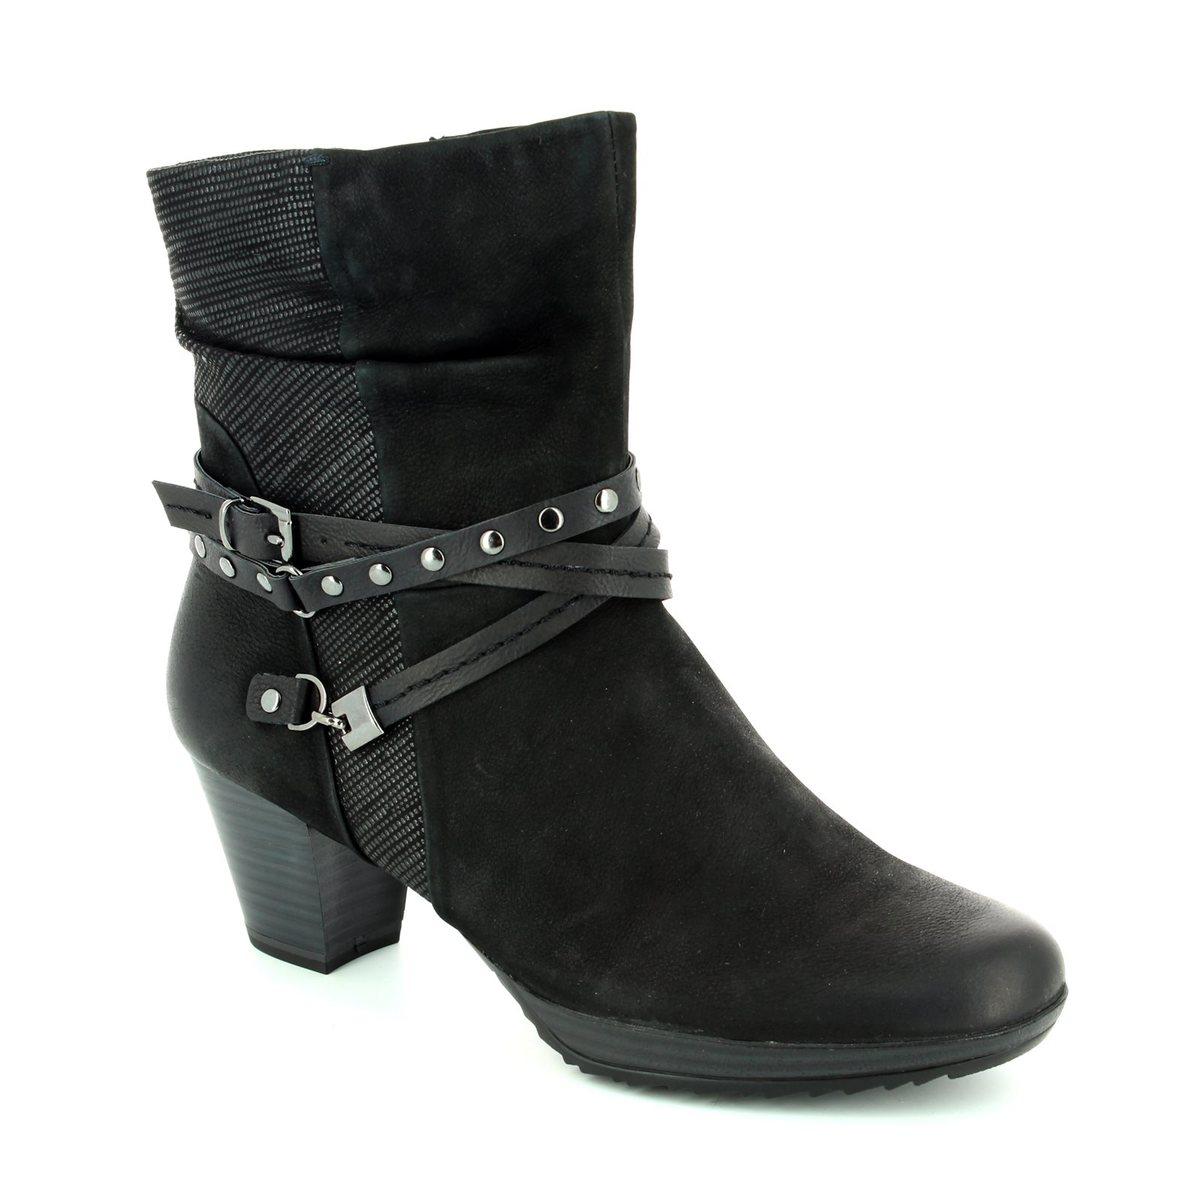 f437b3f2bf Marco Tozzi Ankle Boots - Black - 25421 096 BARSANTI 62